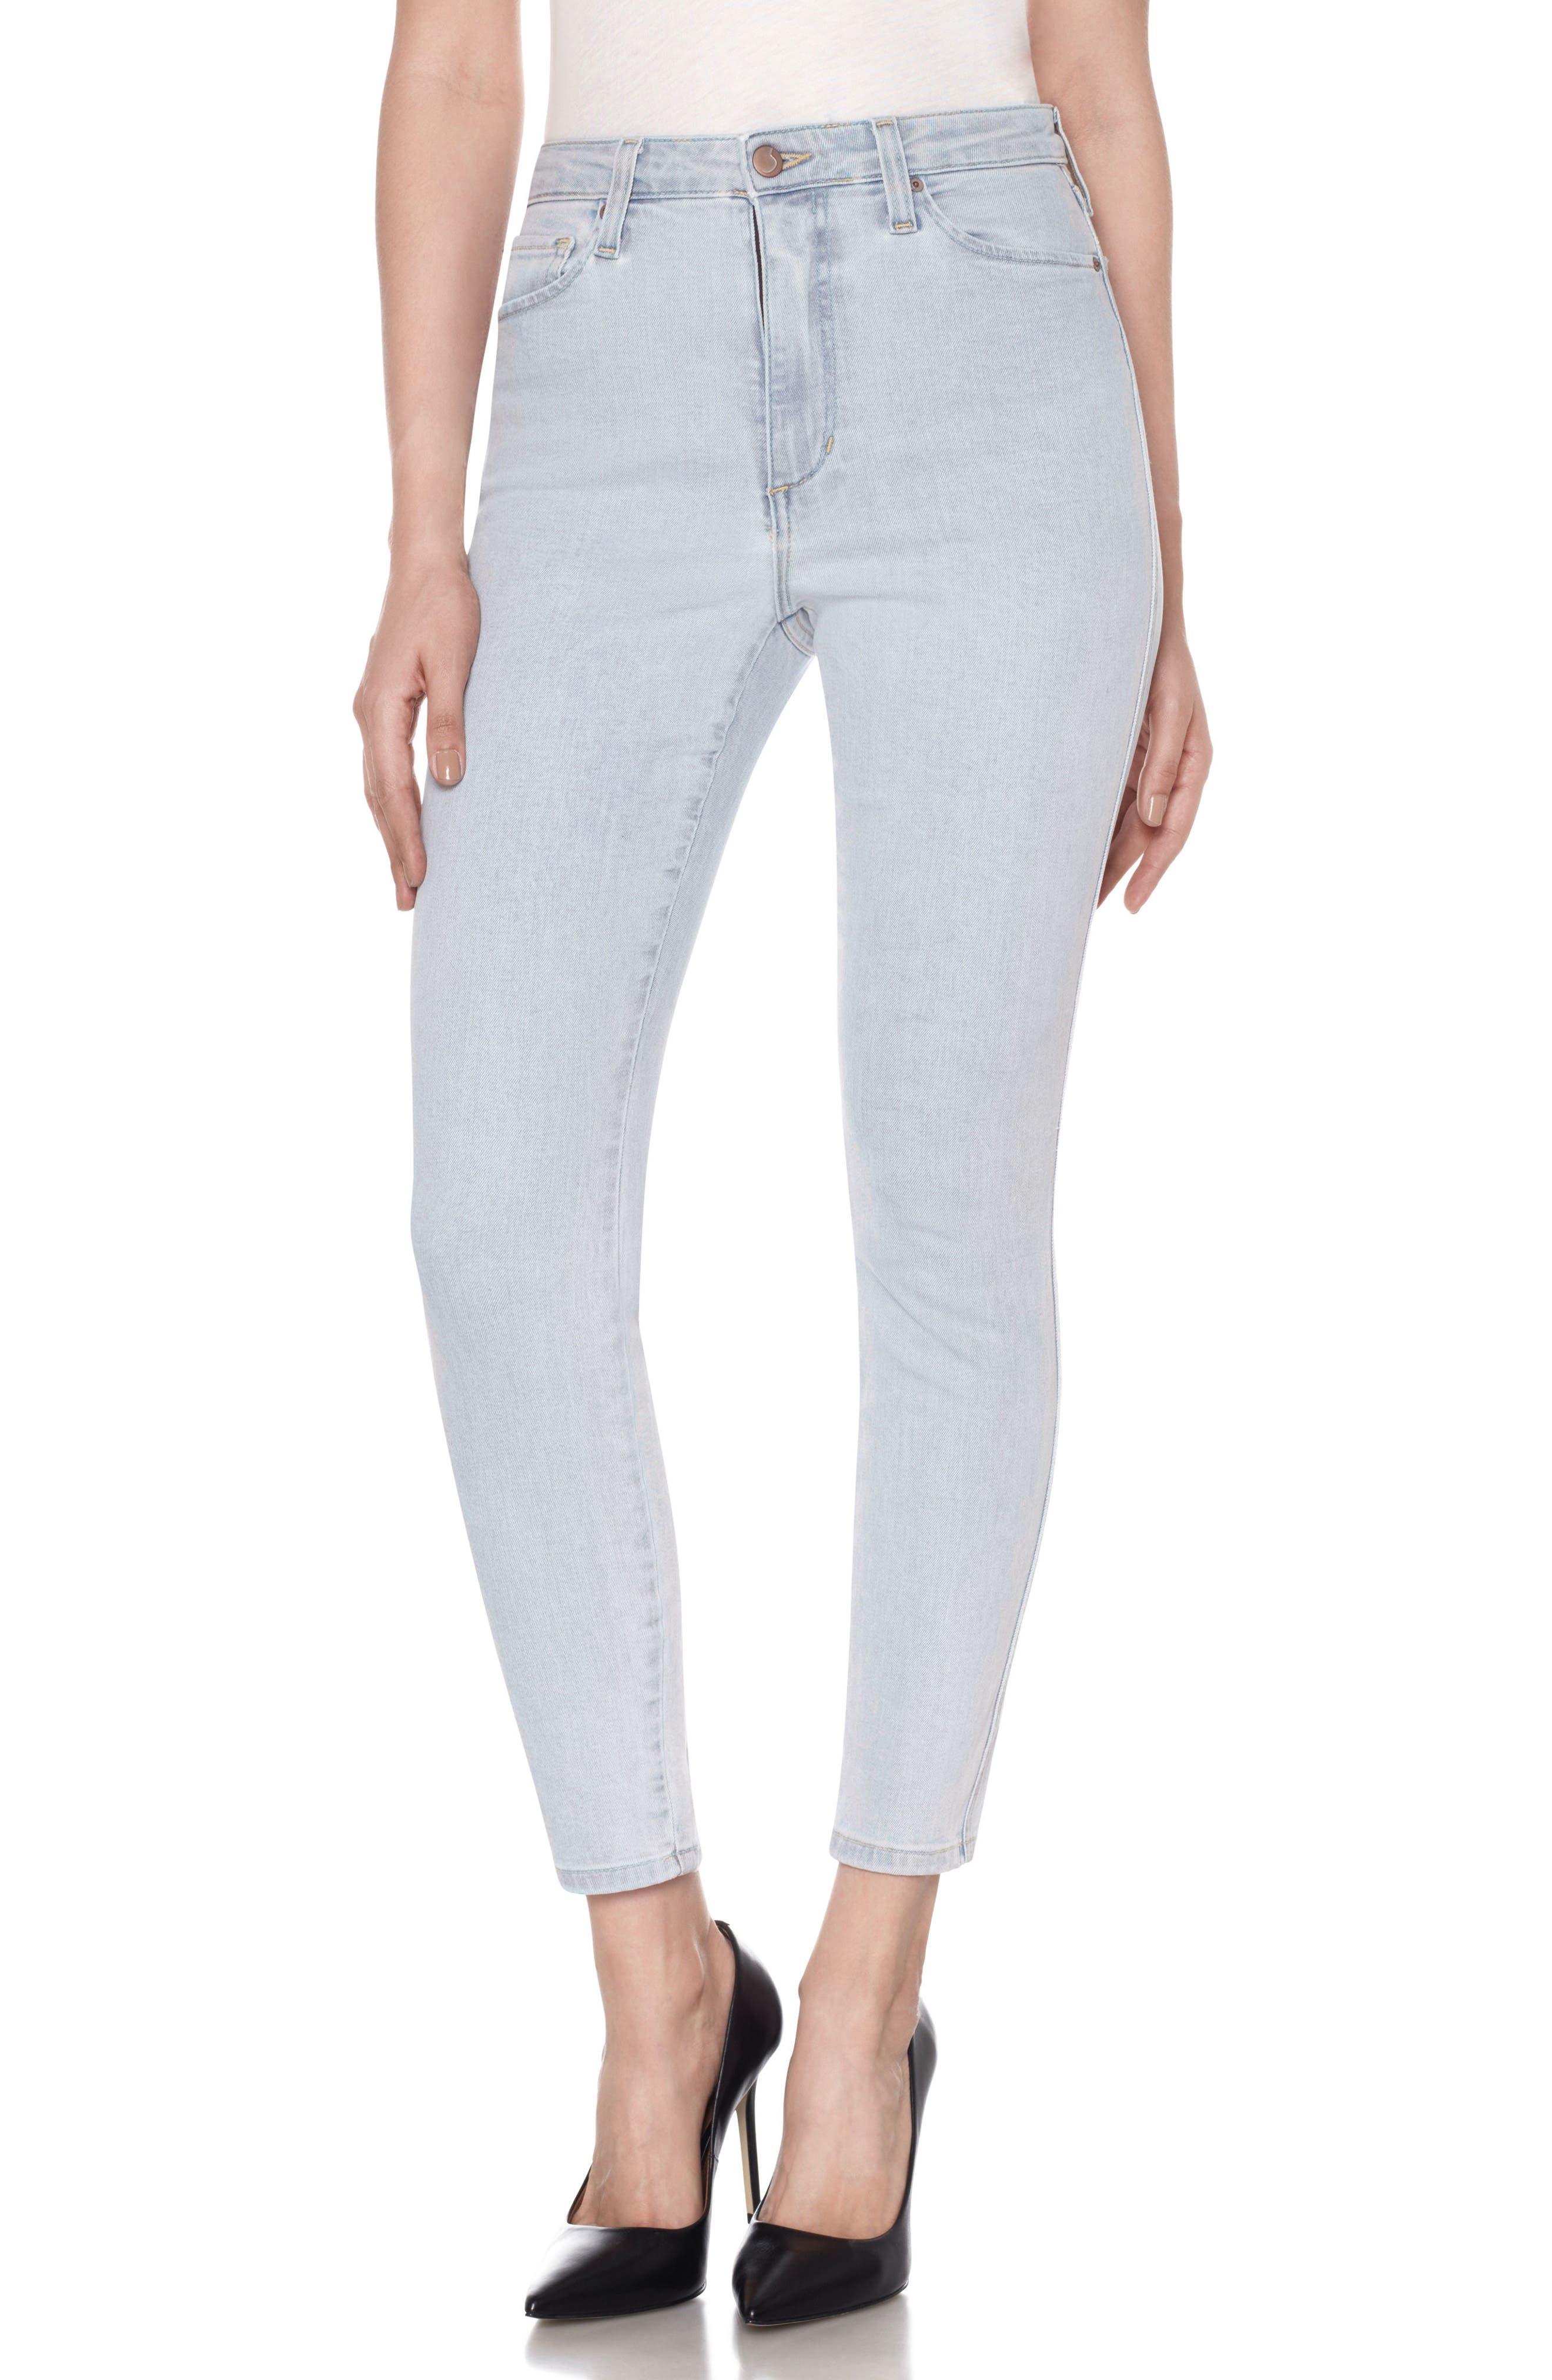 Alternate Image 1 Selected - Joe's Flawless - Bella High Waist Ankle Skinny Jeans (Amada)